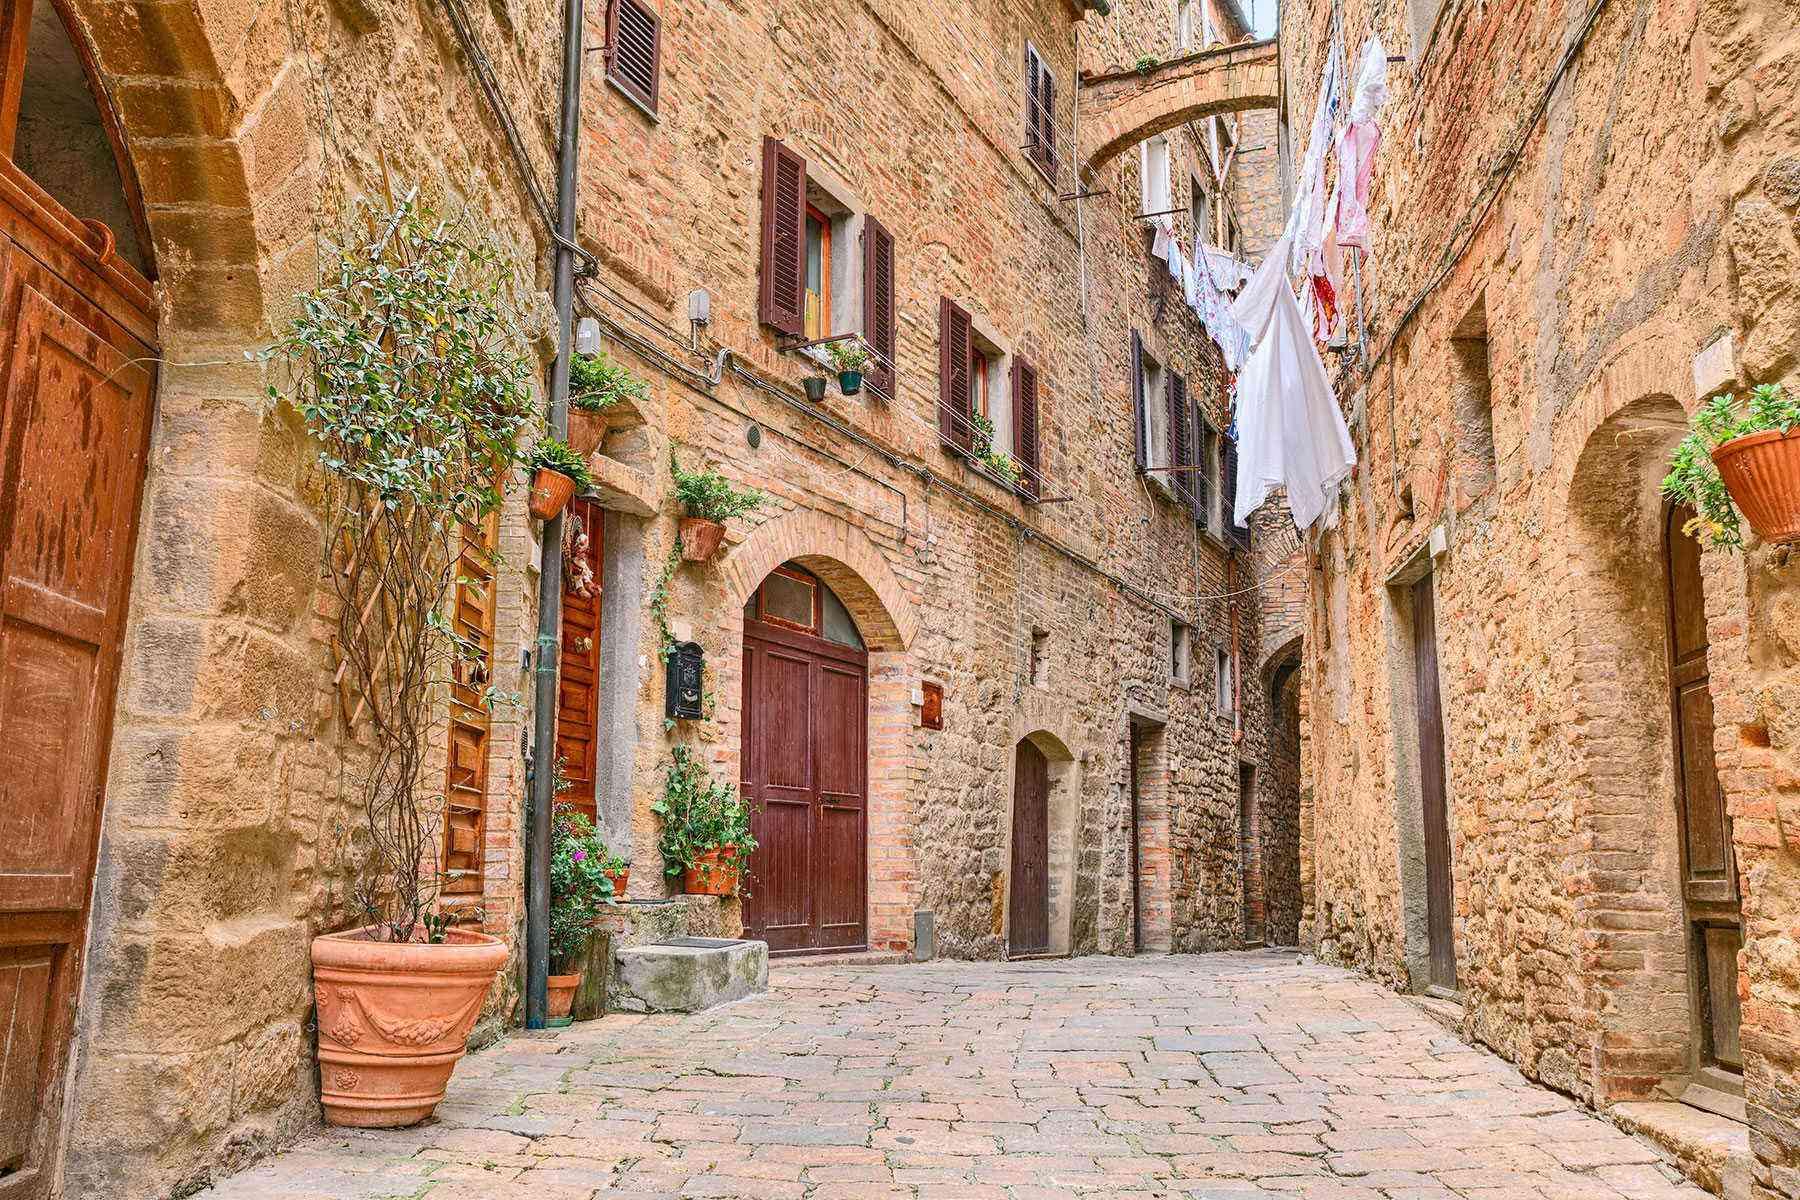 Medieval-Italian-Towns-Volterra-2